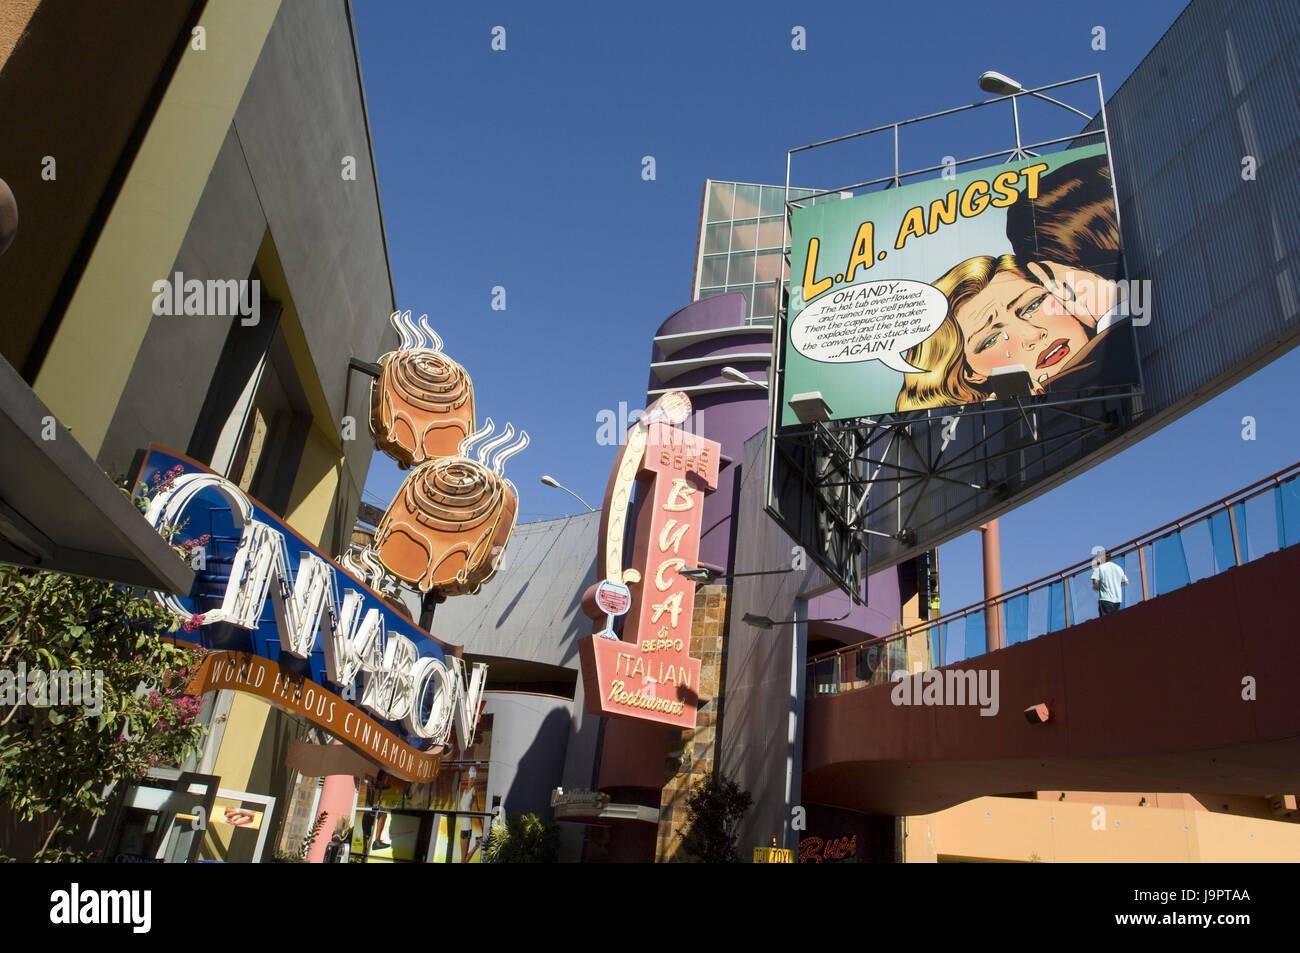 Citywalk Universal Studios Stock Photos & Citywalk Universal